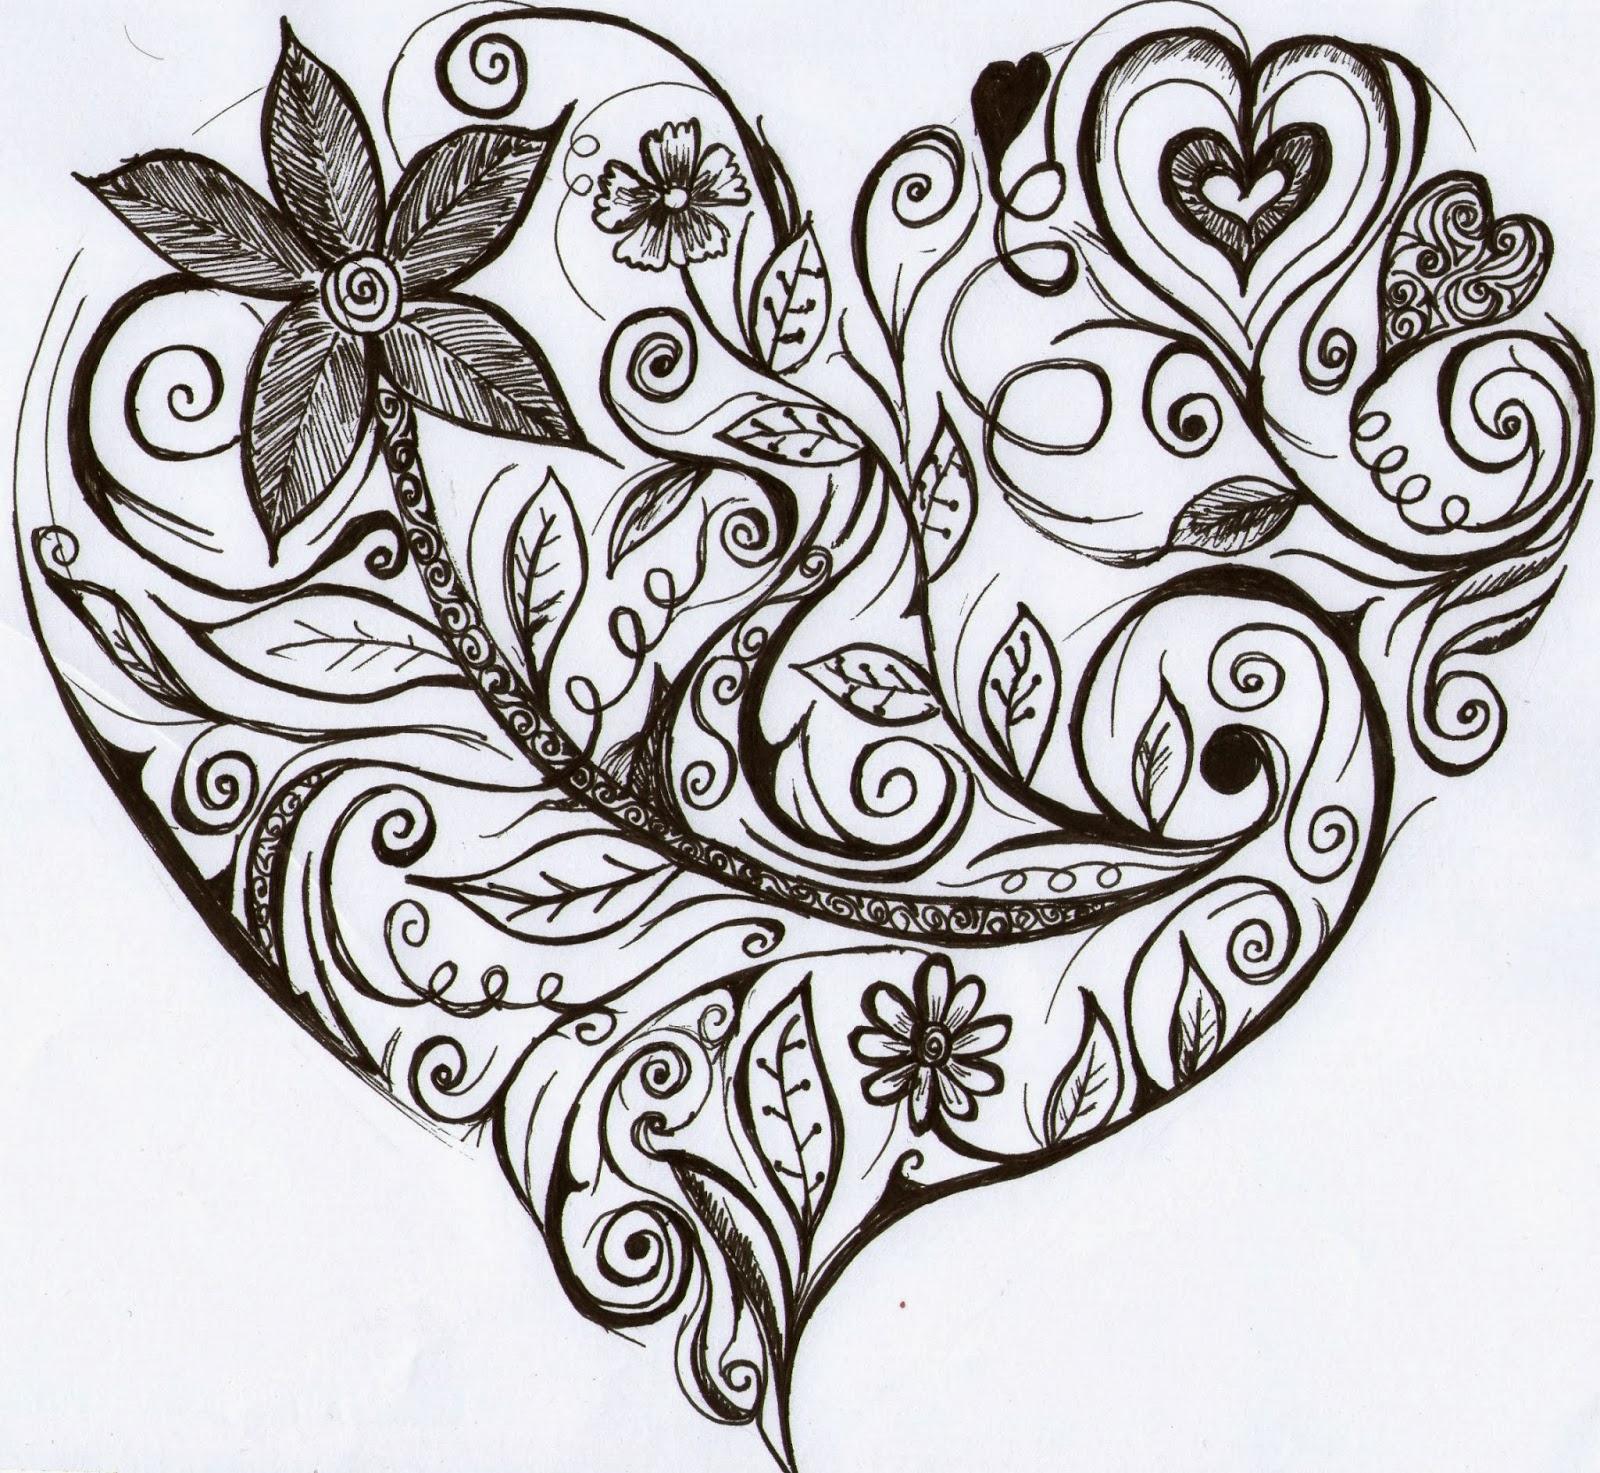 Positiva creativa regalos detalles ideas de san valentin - Ideas para regalo de san valentin ...